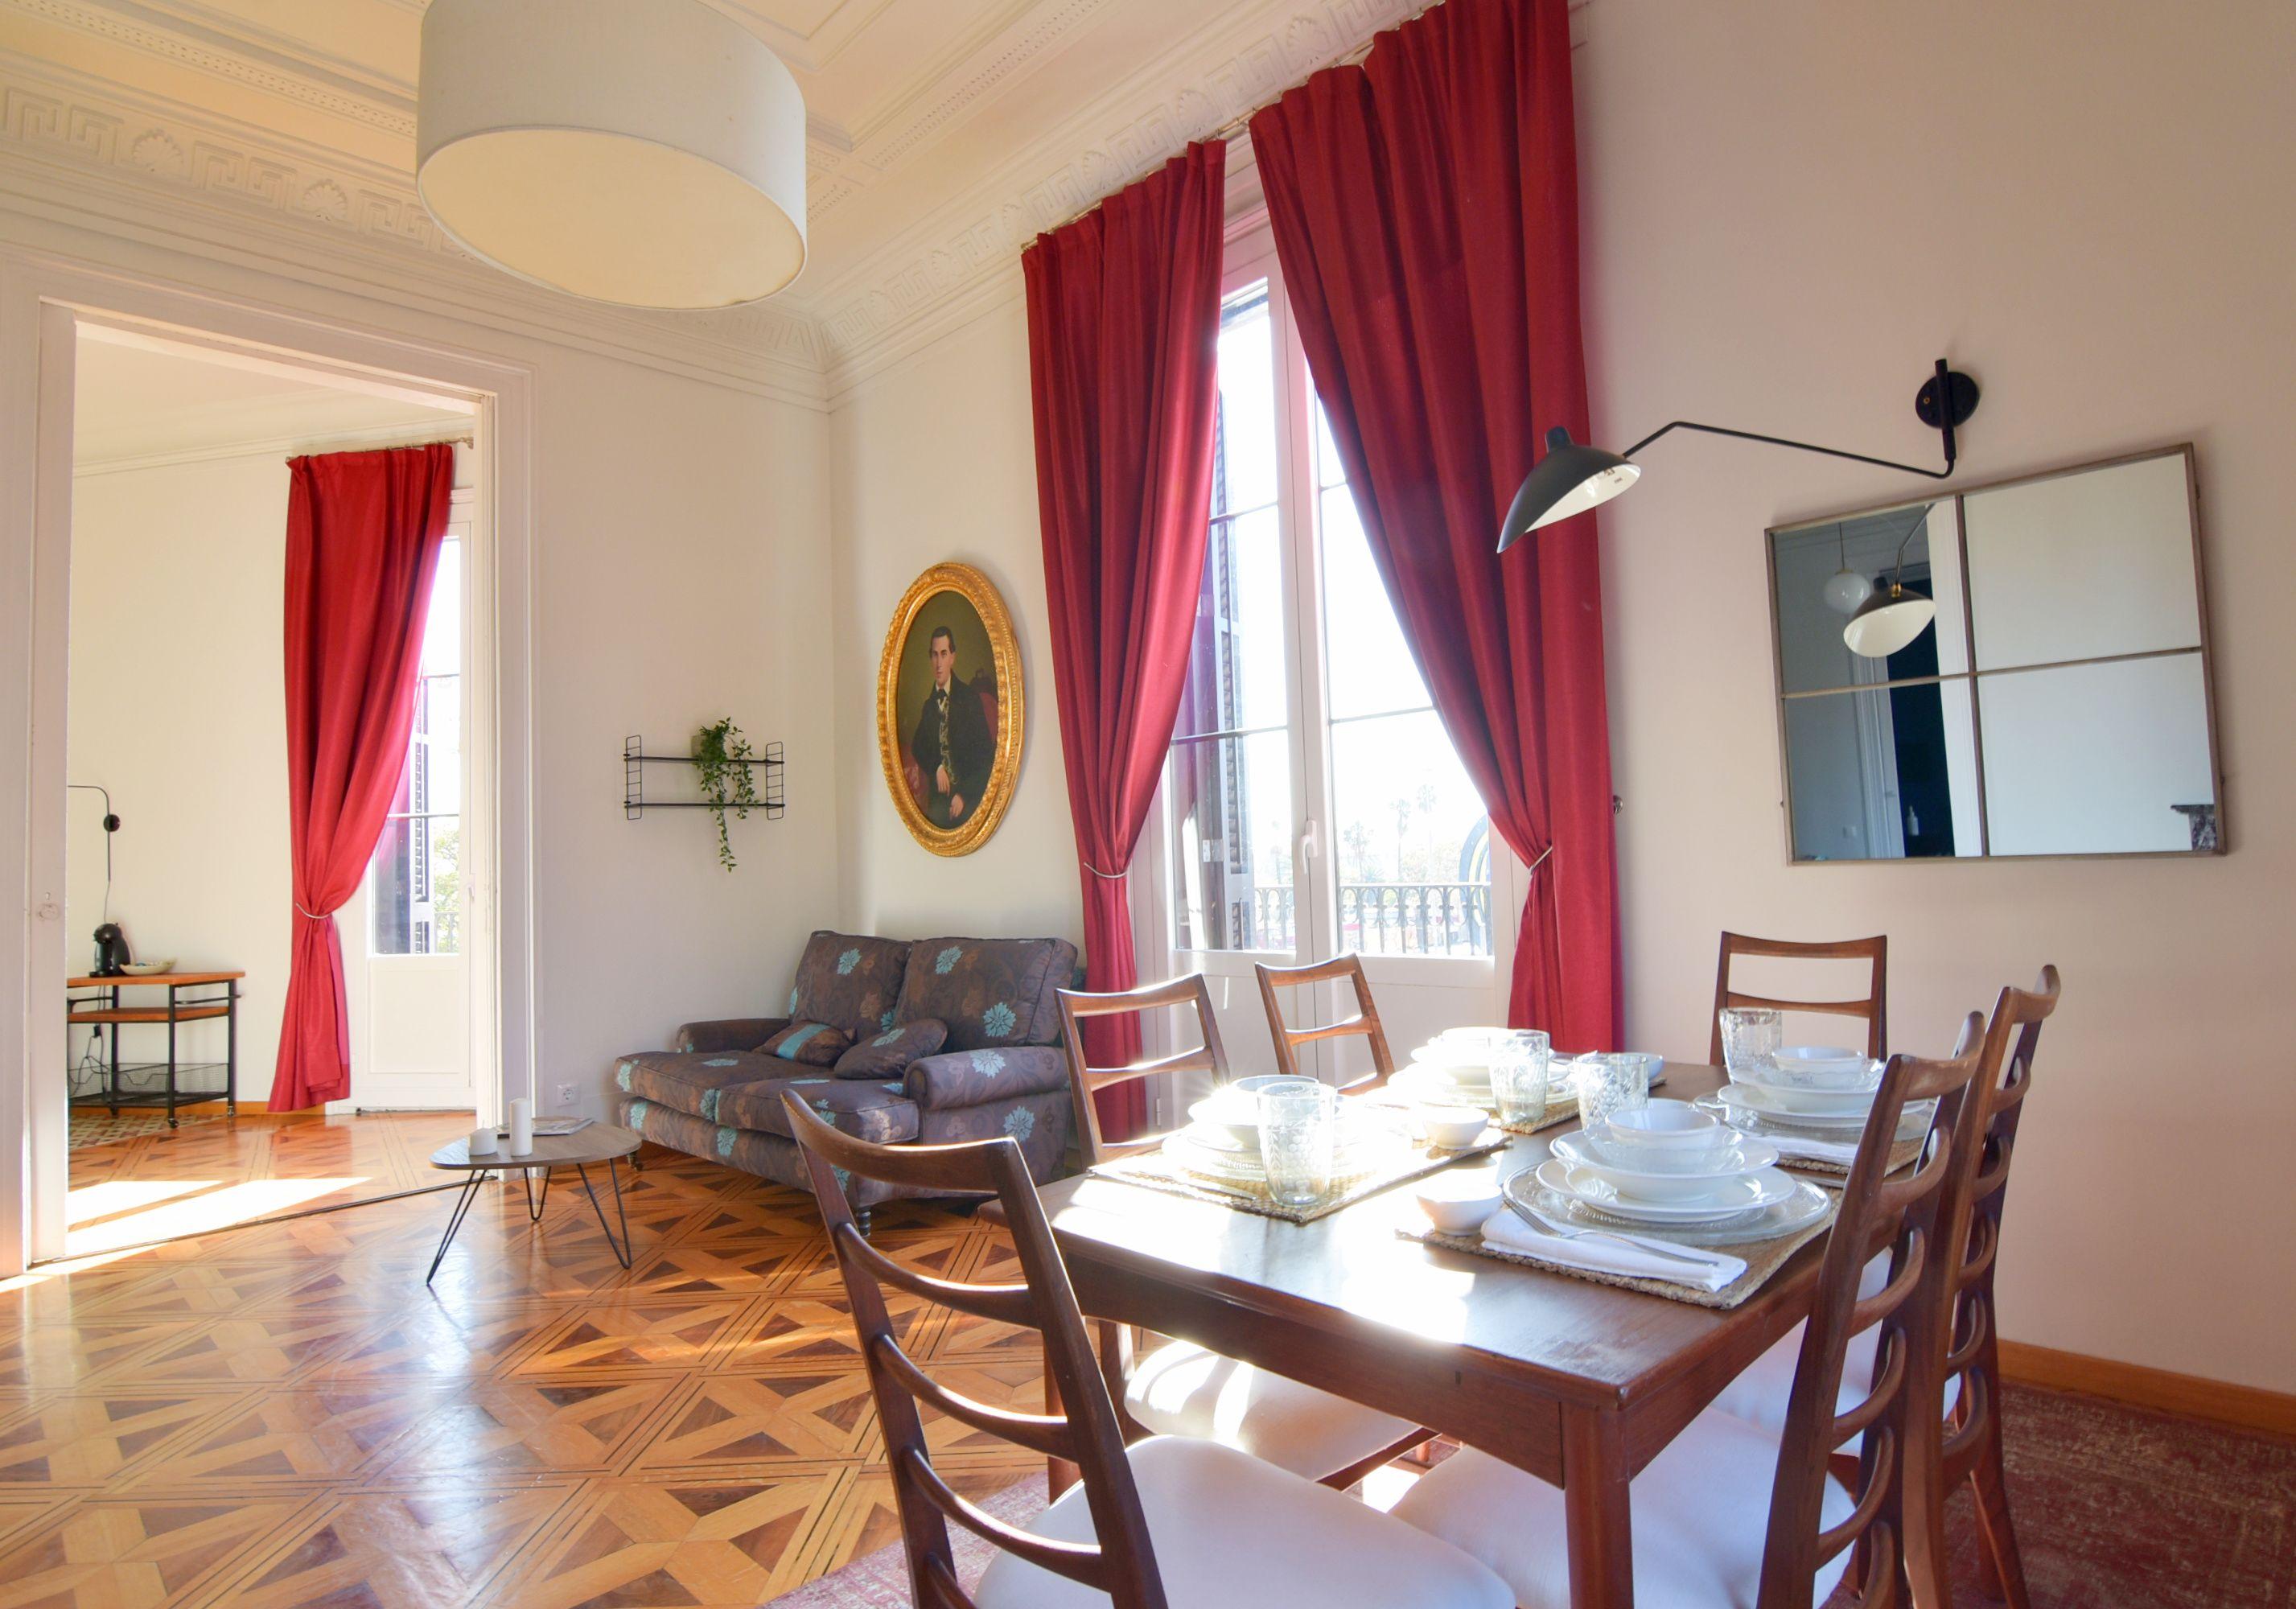 Fotos De Salon Comedor.3 Salon Comedor Living And Dining Room 1840 Apartments